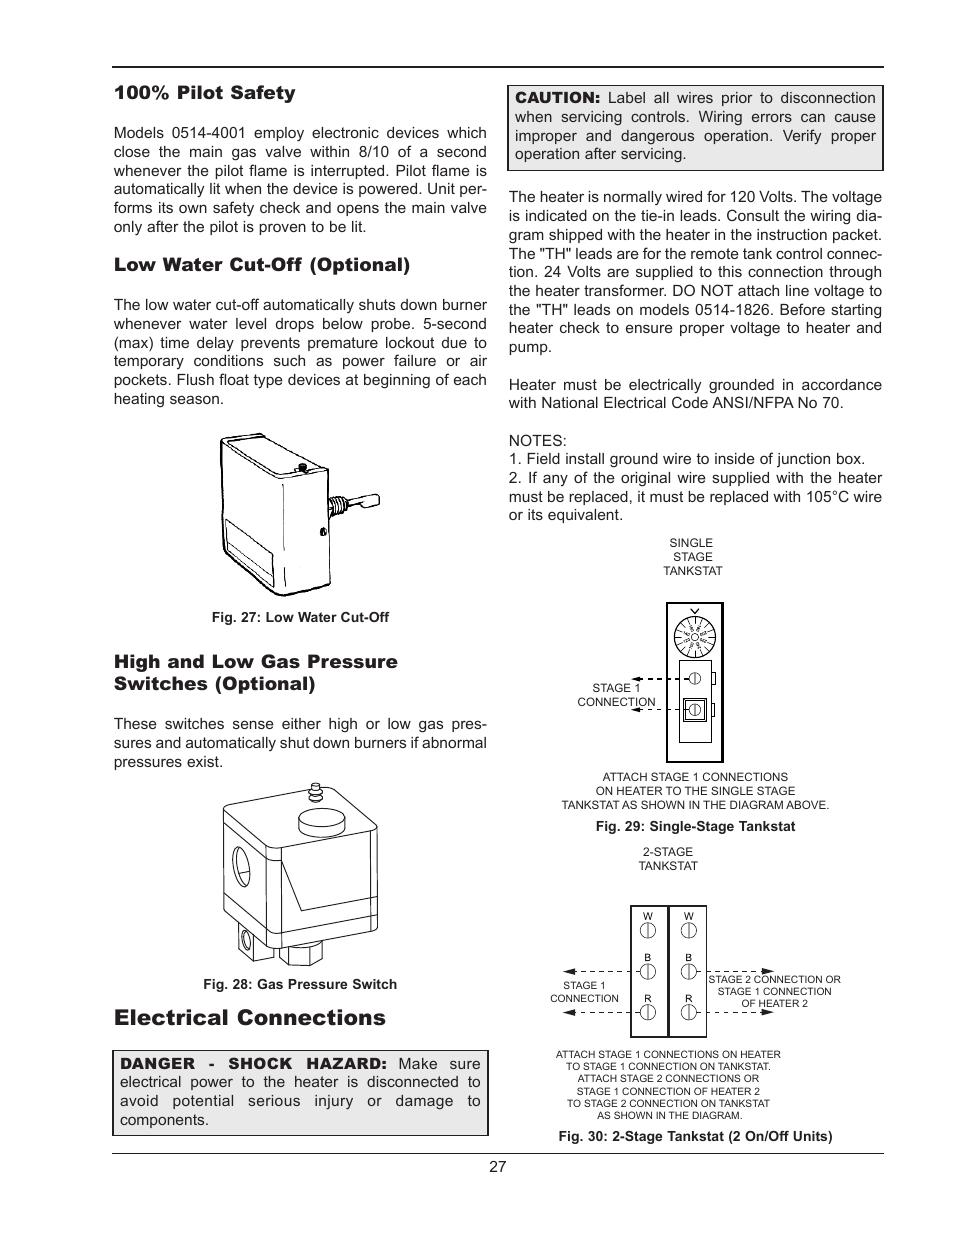 medium resolution of raypak 1529 wiring diagram wiring library aquacal wiring  diagram raypak 1529 wiring diagram